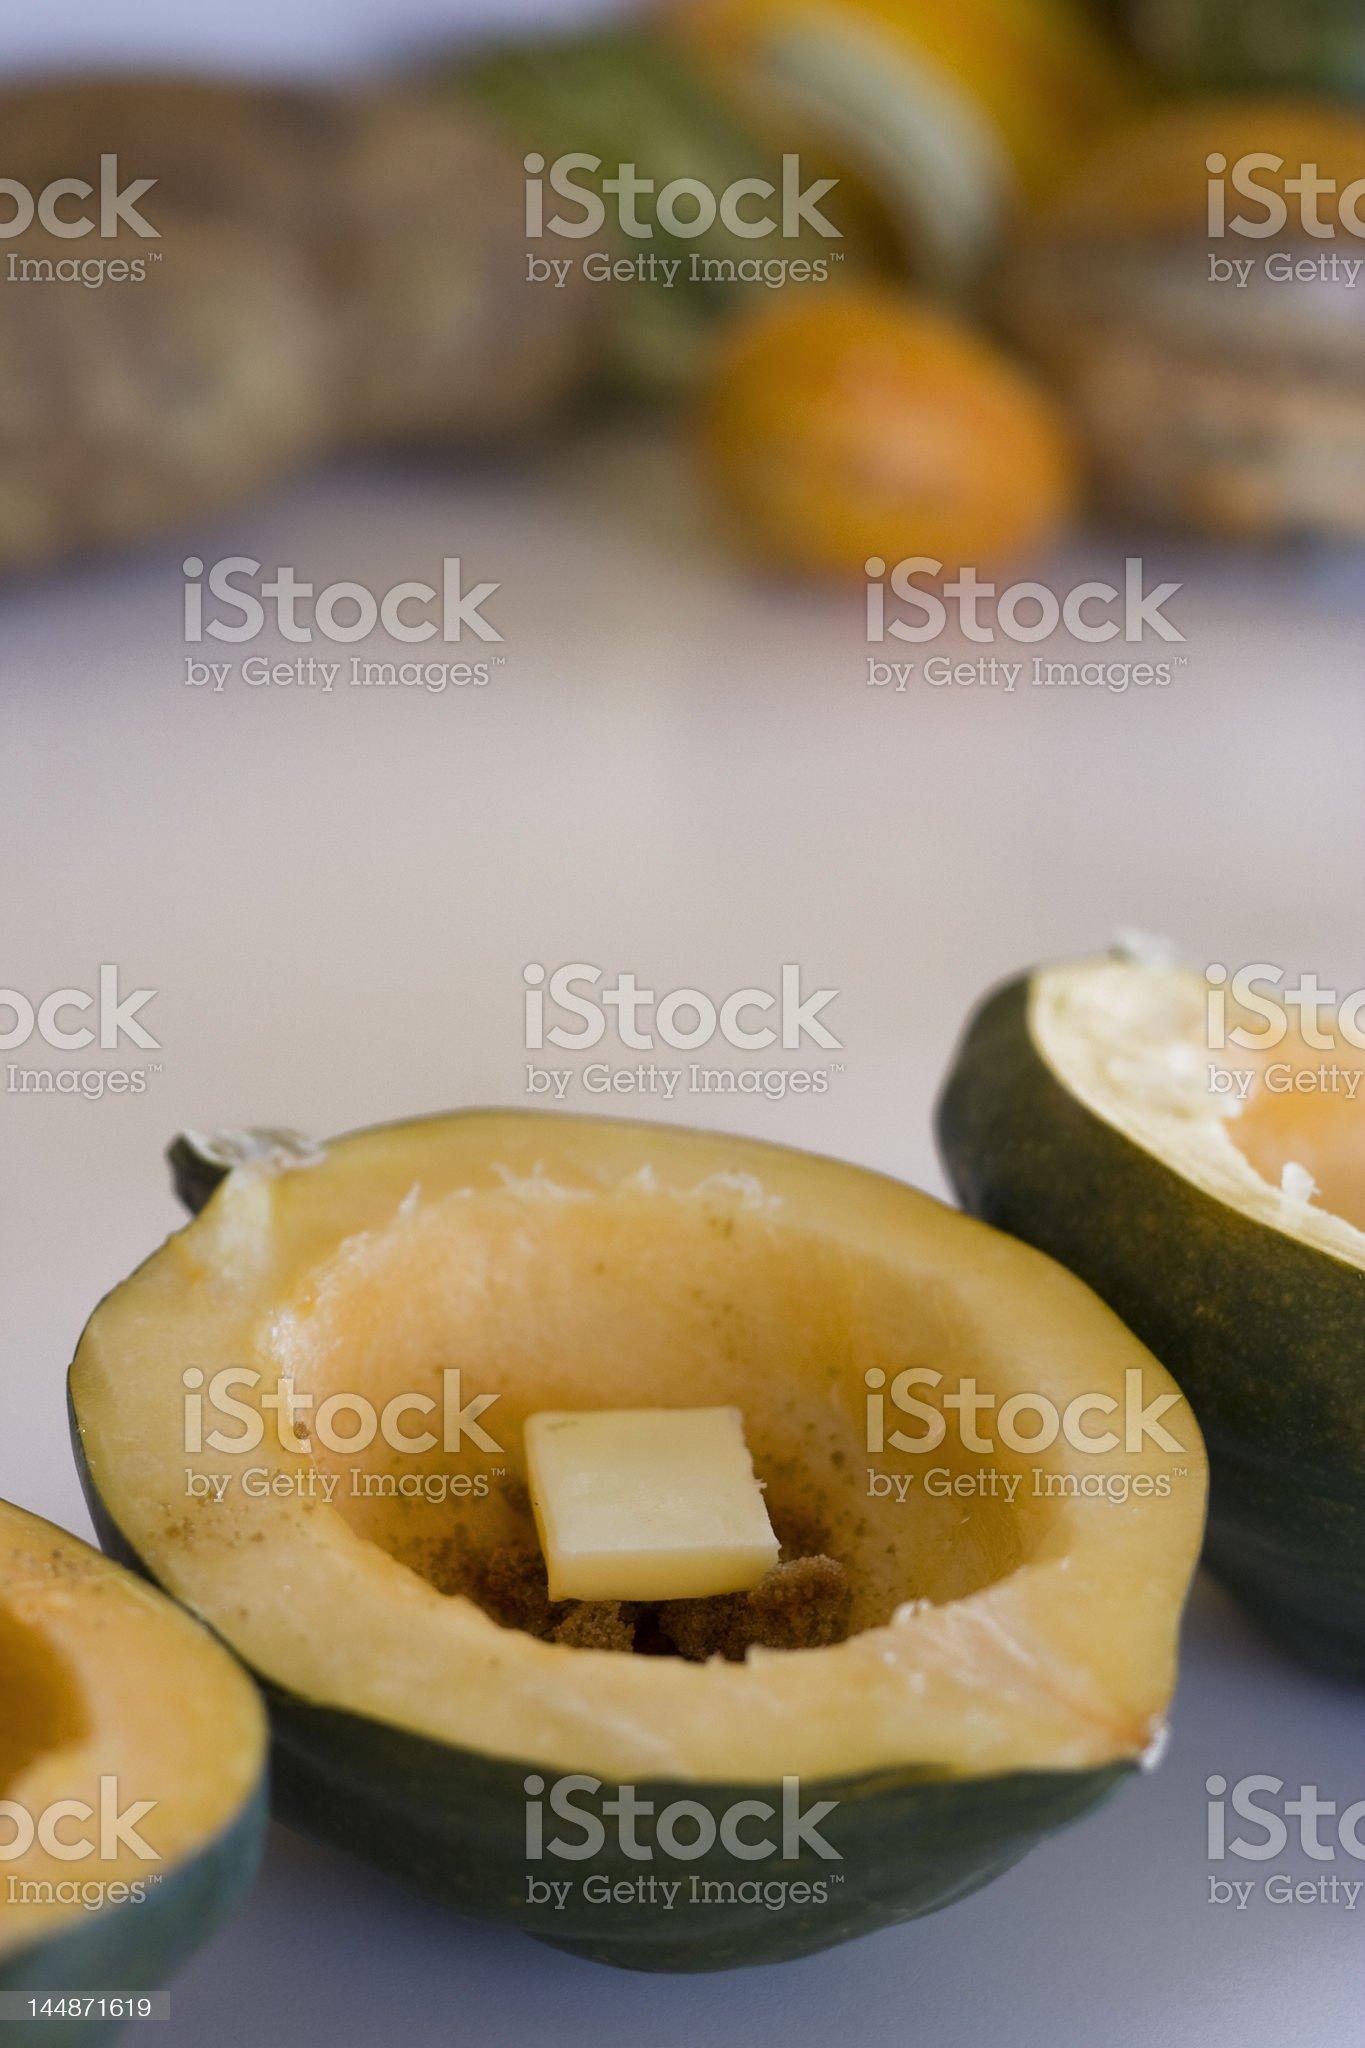 Acorn Squash royalty-free stock photo